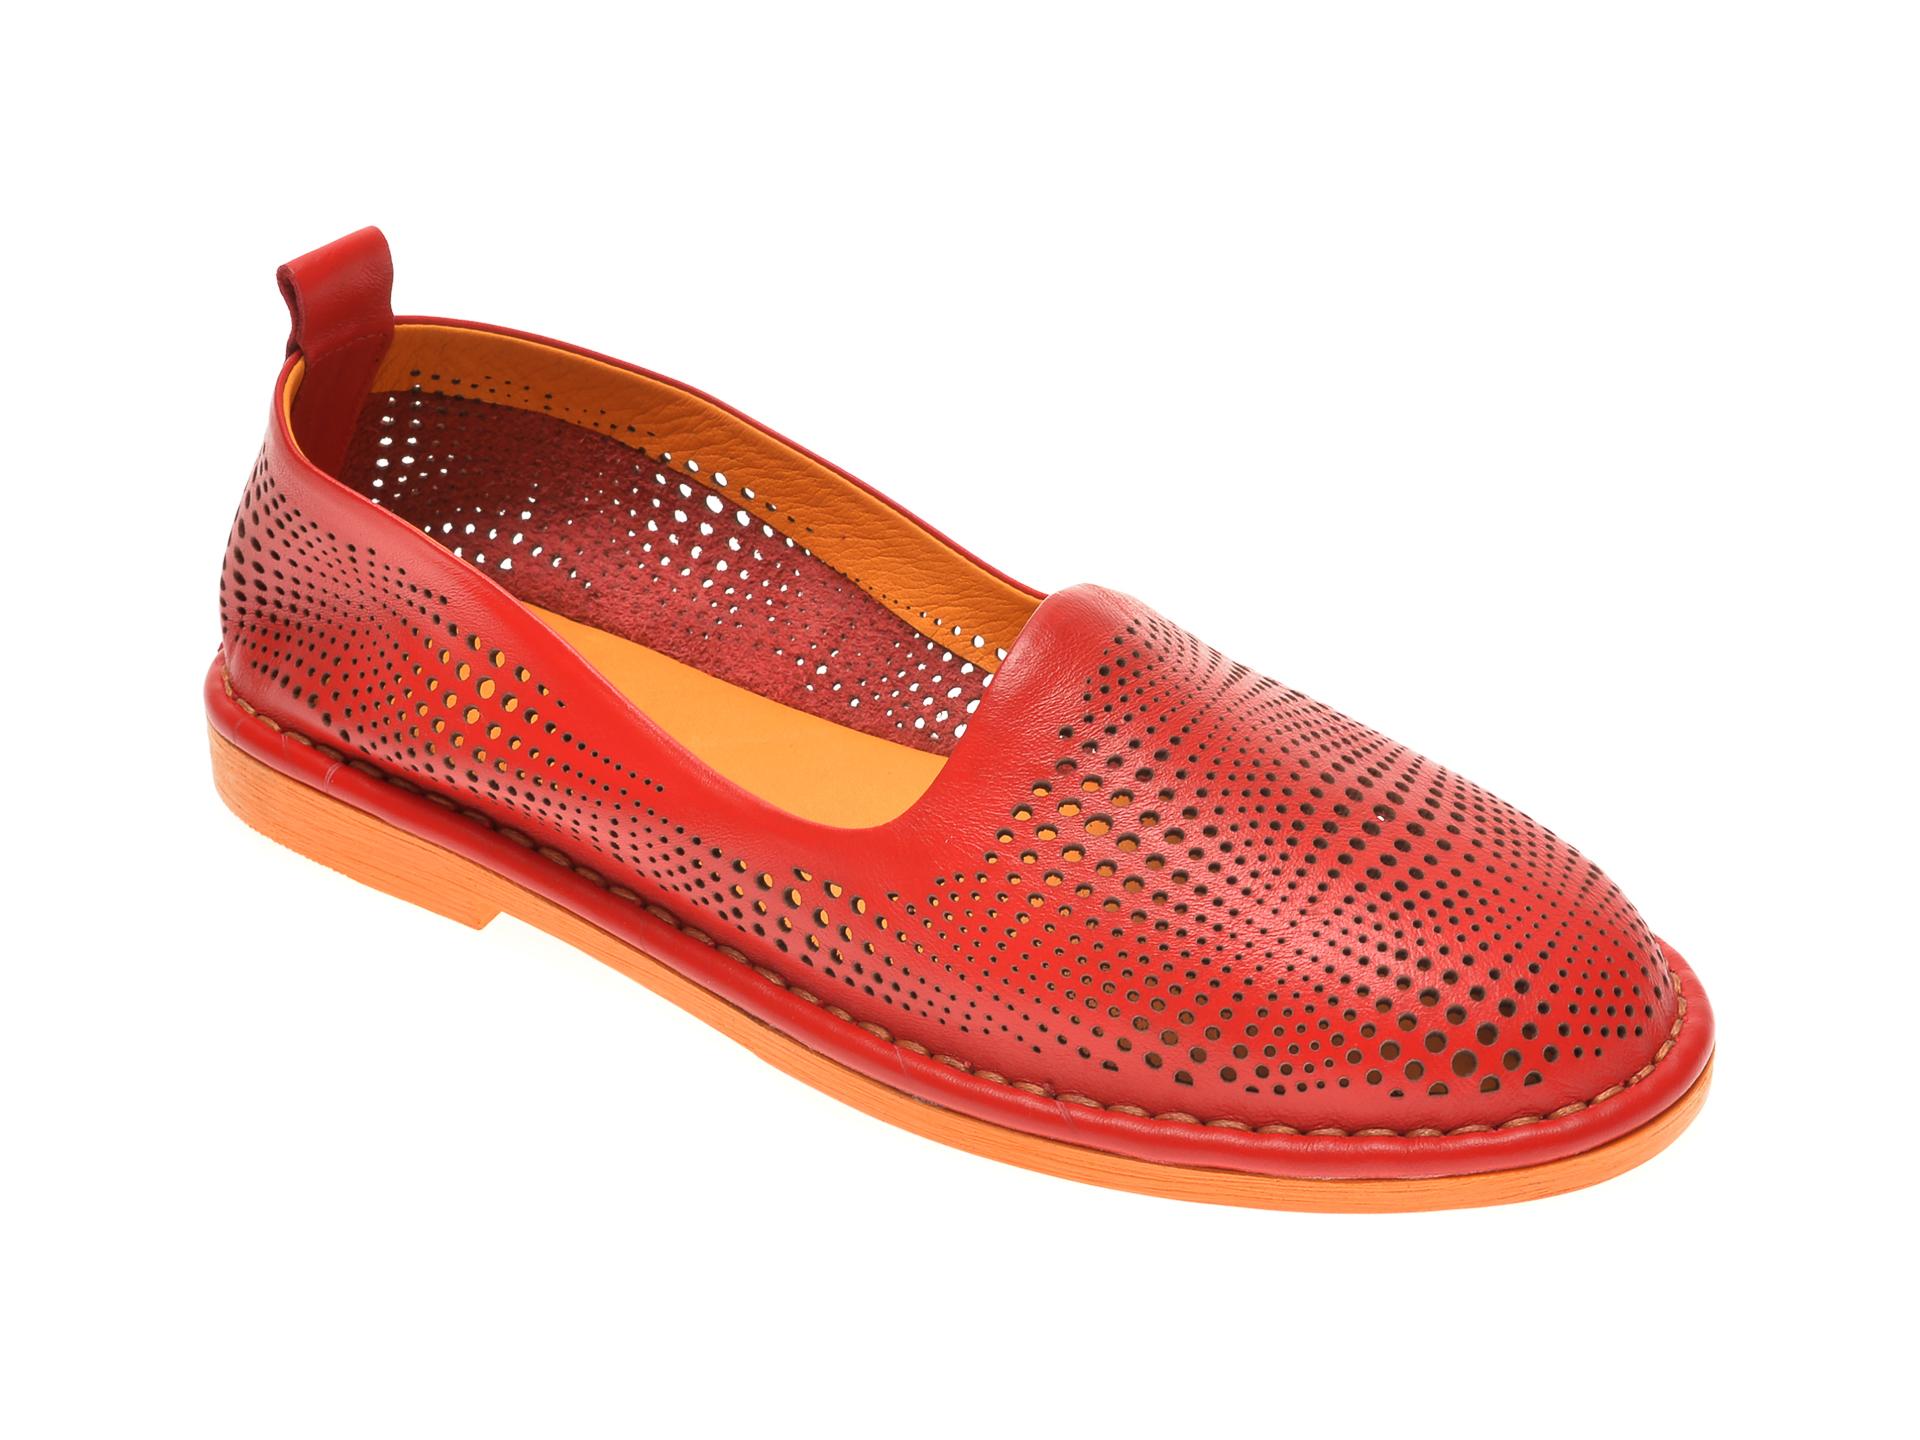 Pantofi LE BERDE rosii, 76600M5, din piele naturala